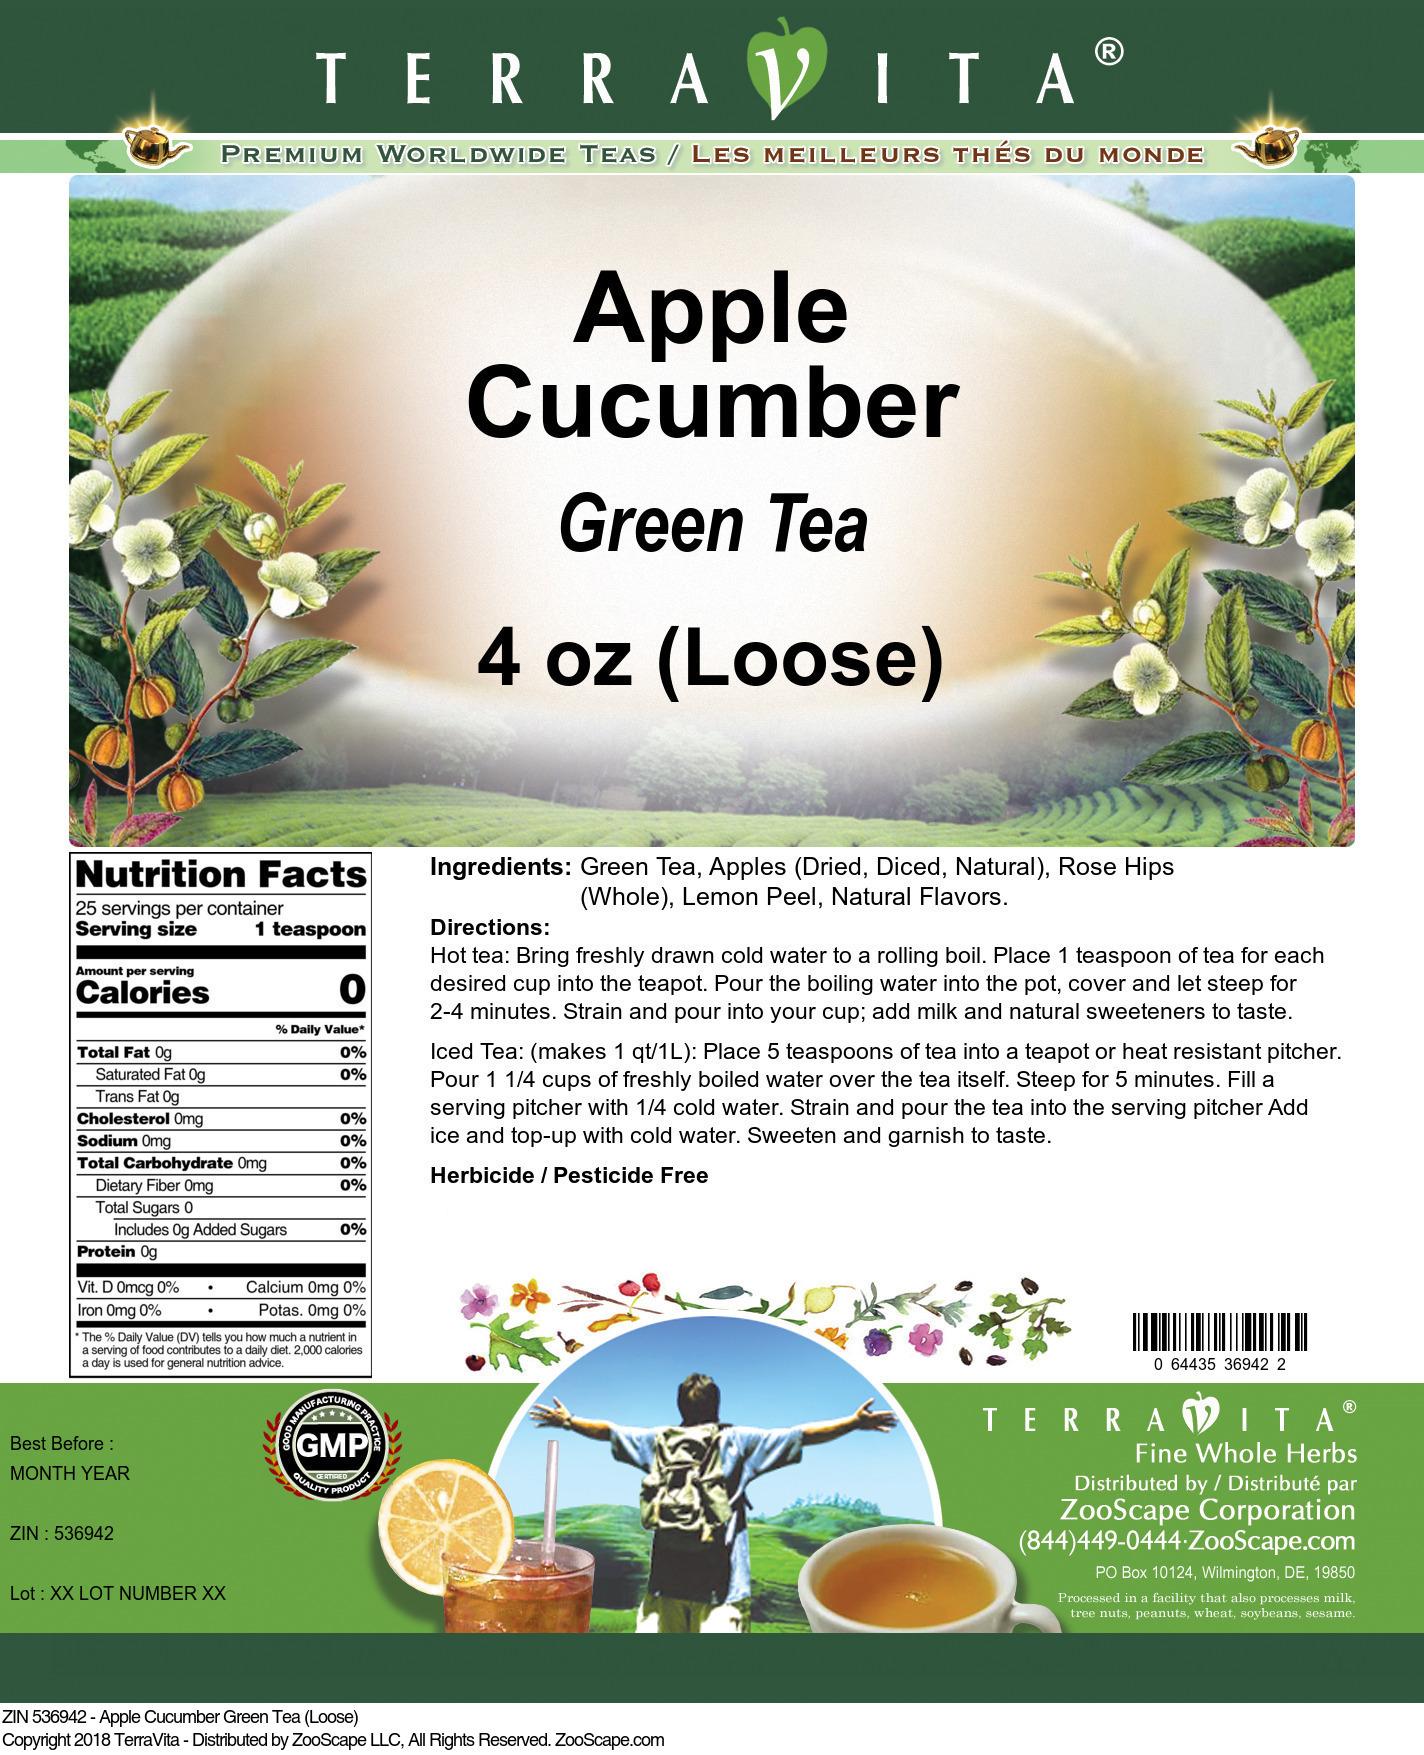 Apple Cucumber Green Tea (Loose)